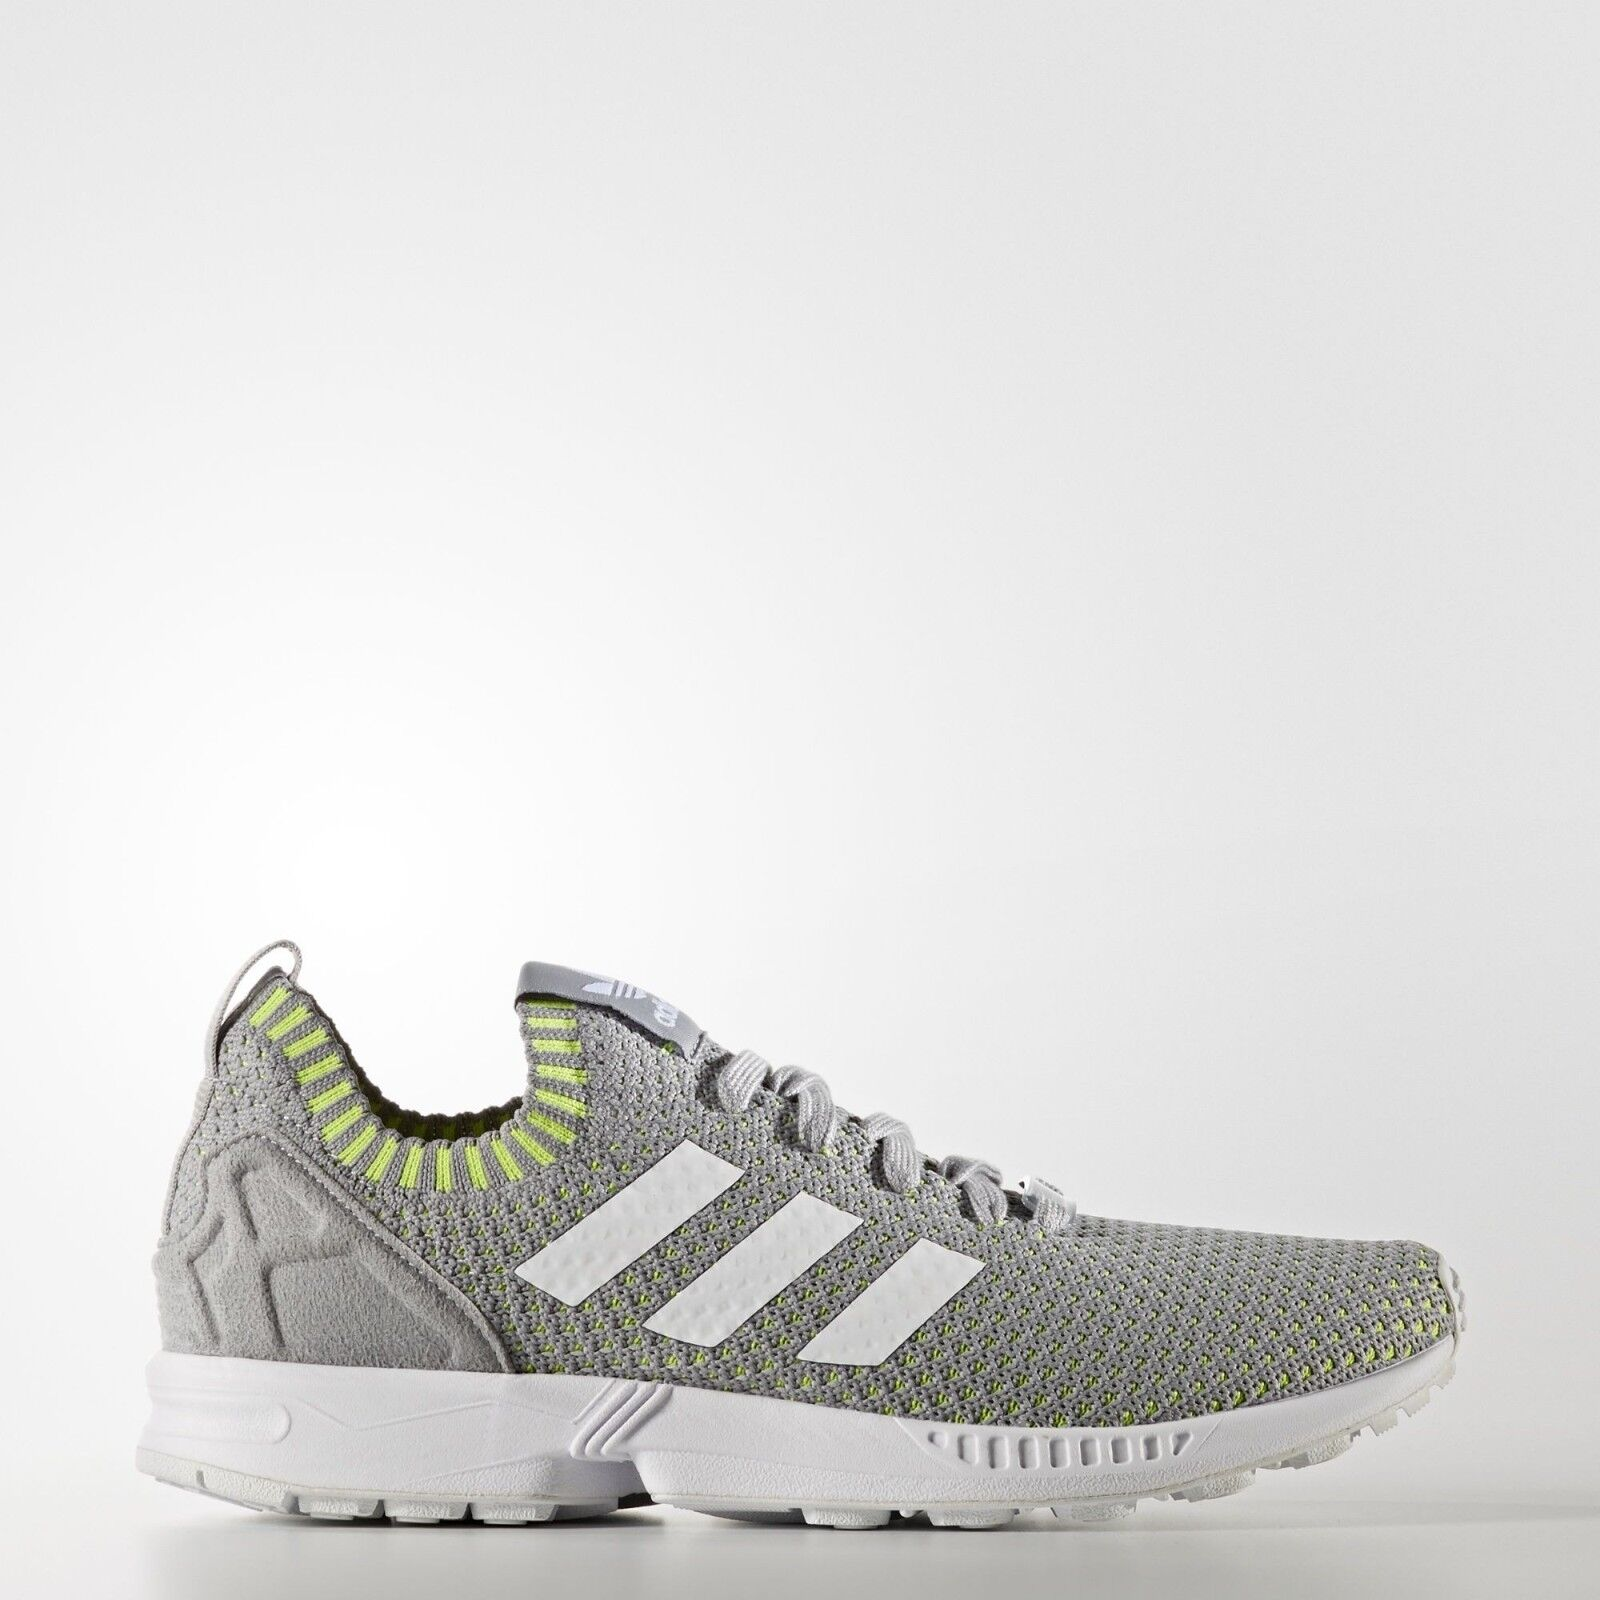 Adidas originali zx flusso pk scarpe primeknit grey / giallo scarpe pk casual sz 10,5 ba7376 b7f401